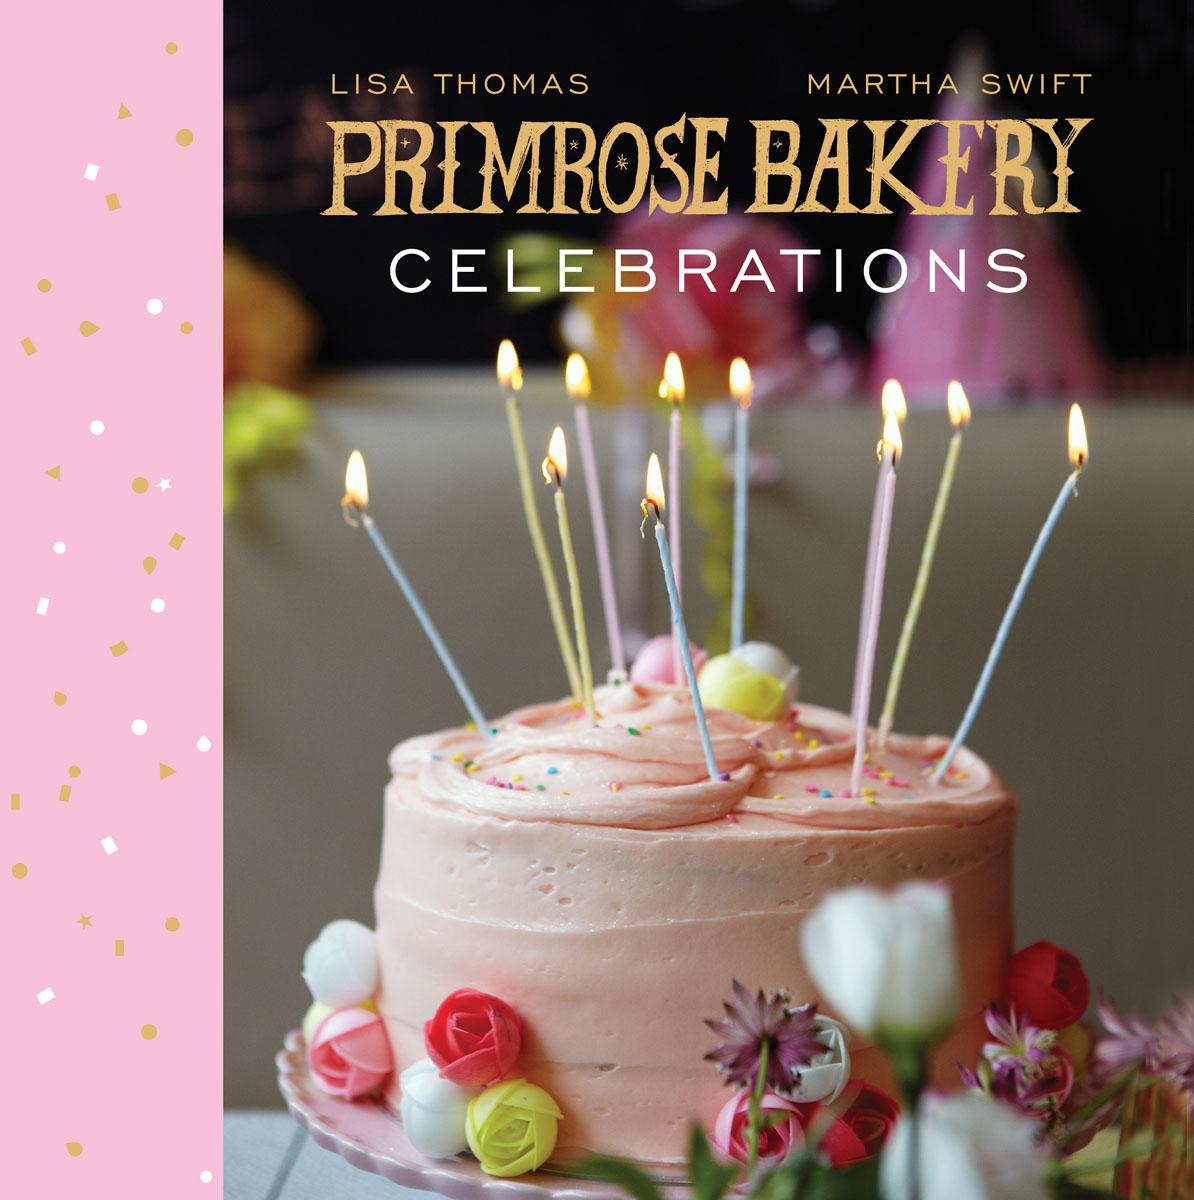 Primrose Bakery Celebrations the primrose bakery book